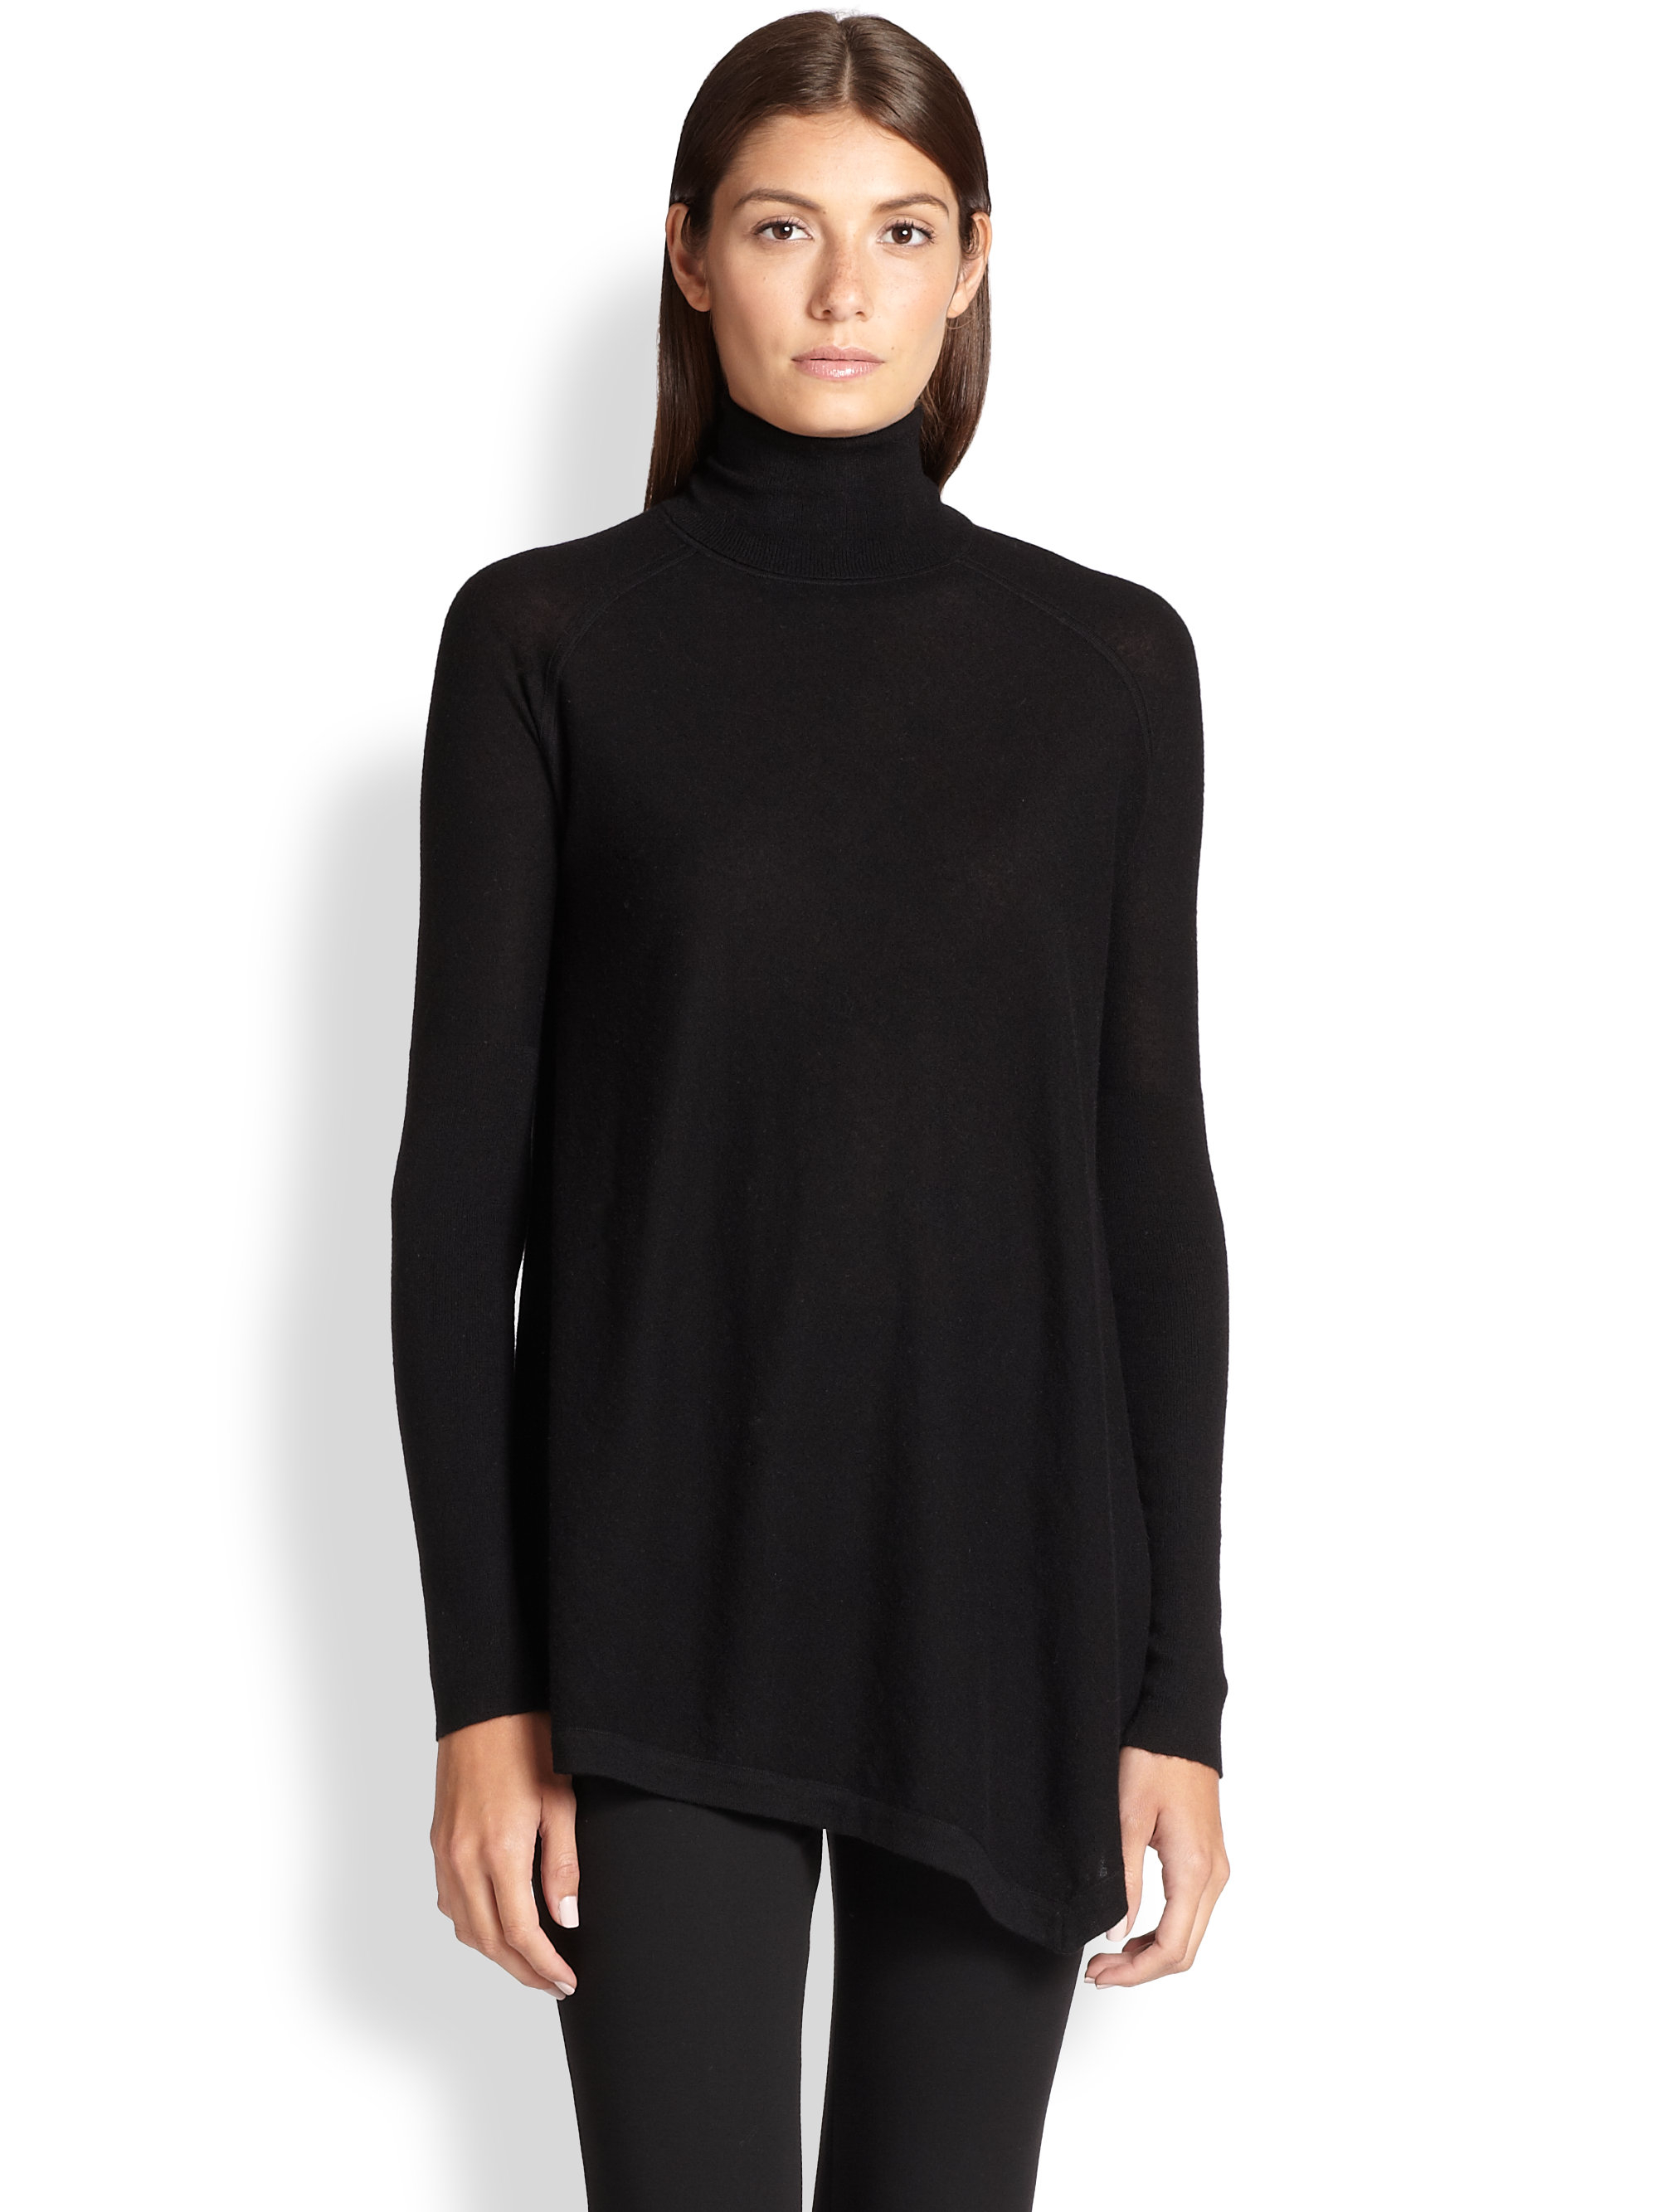 8bac04c6933 Donna Karan Asymmetrical Cashmere Turtleneck Tunic in Black - Lyst